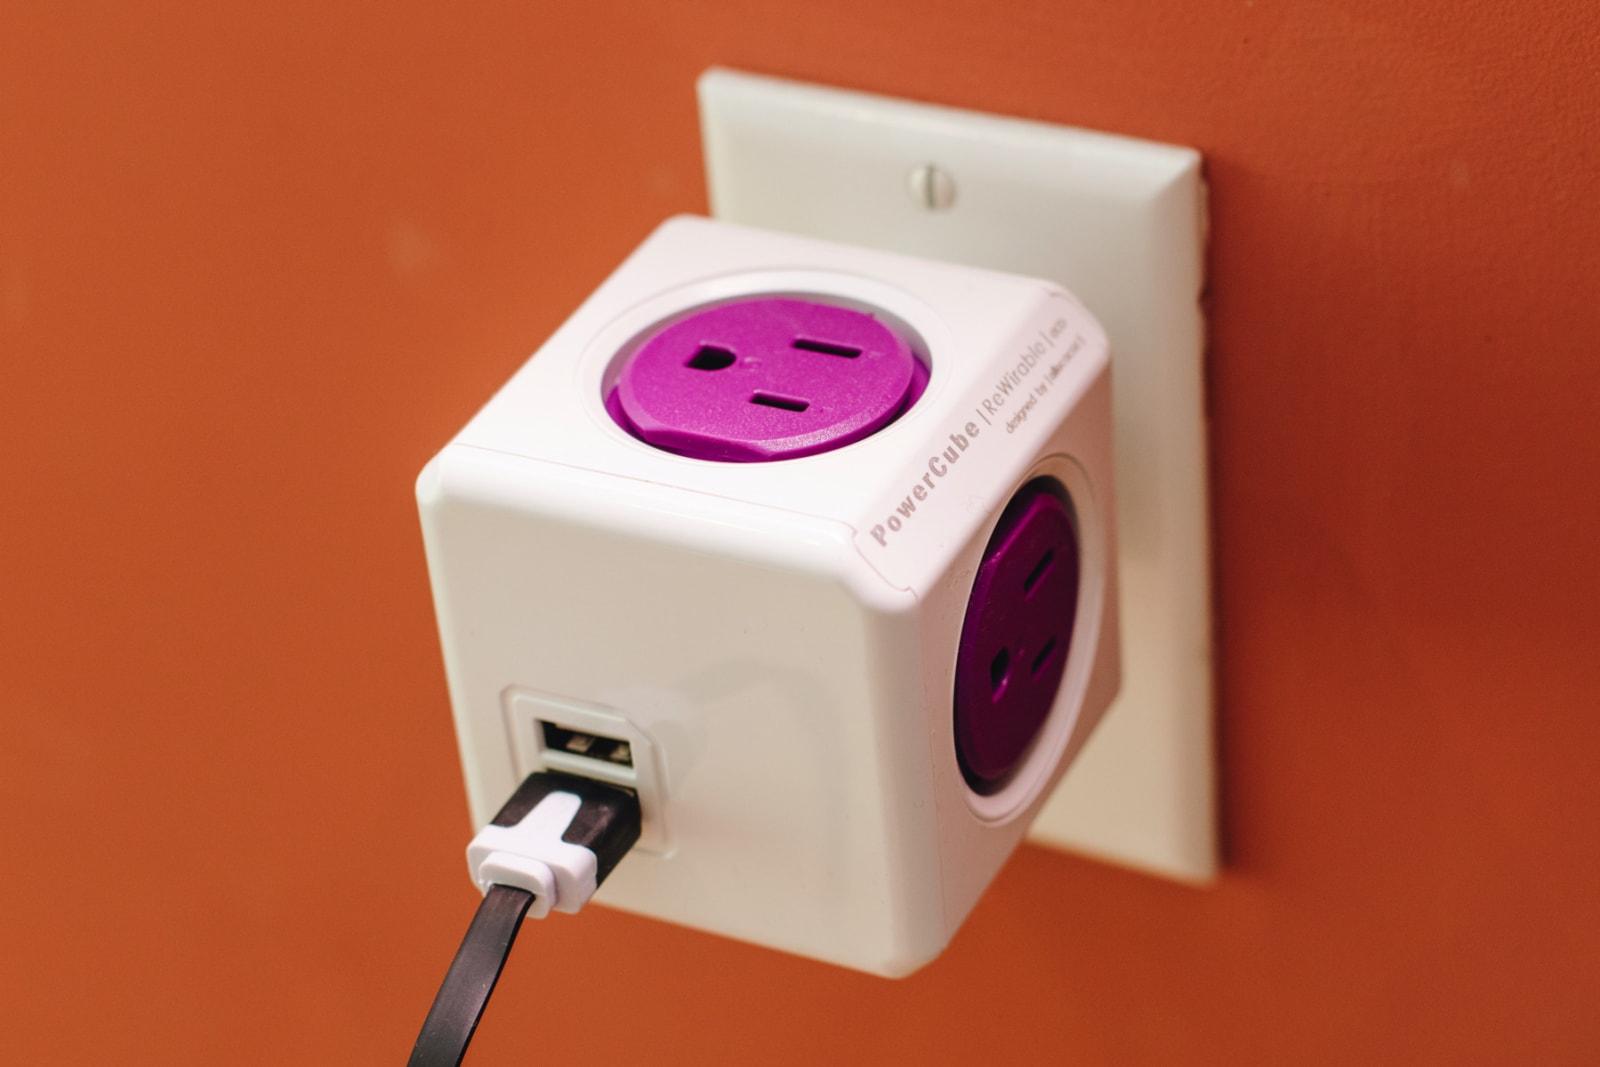 Portable power strips